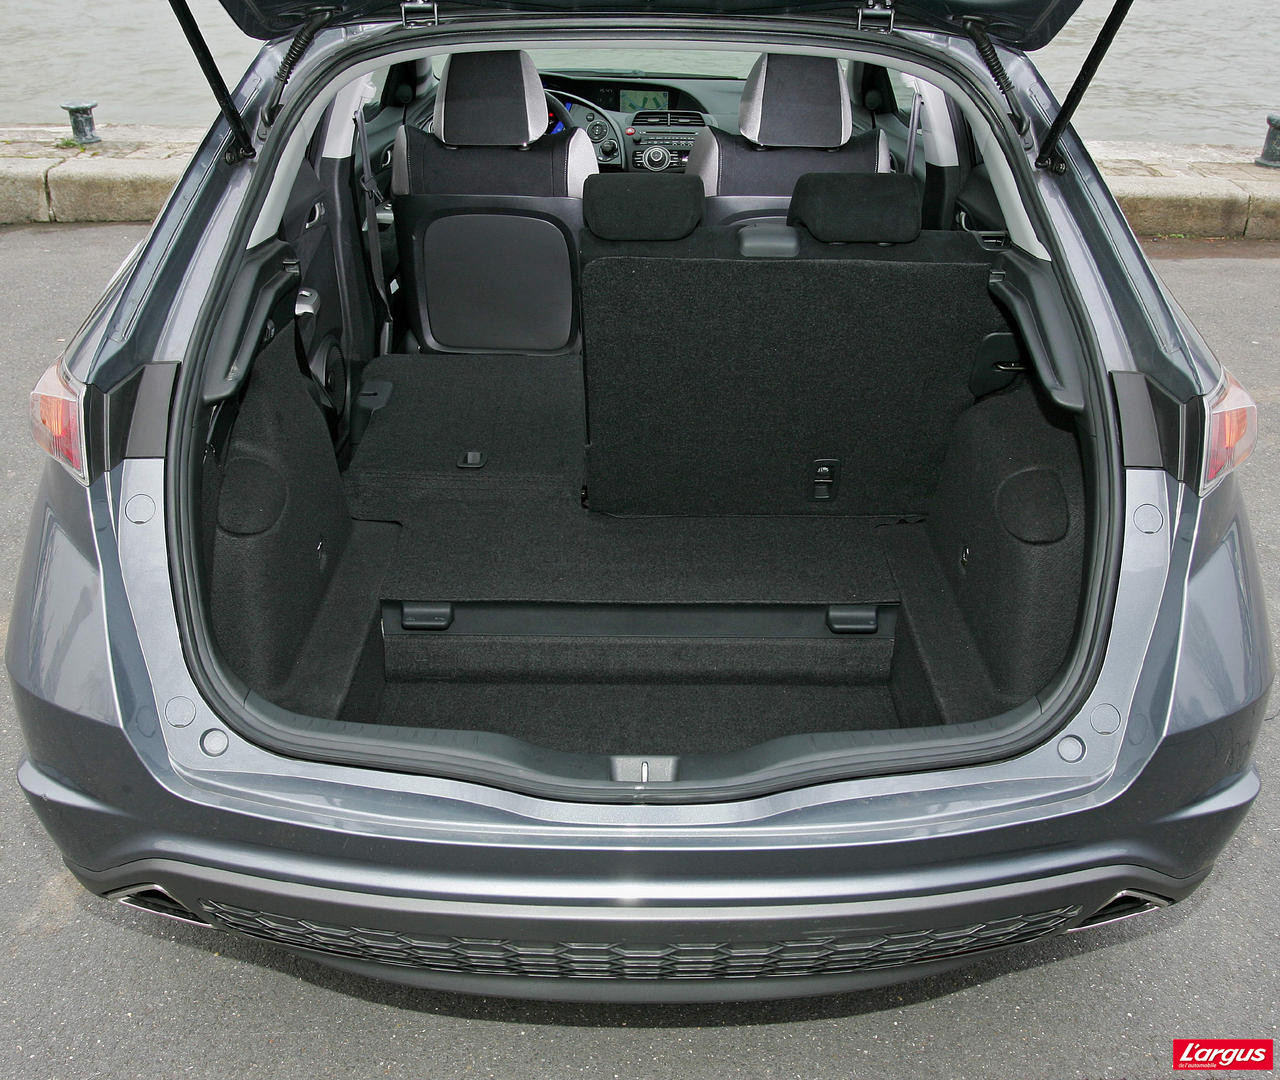 Honda civic viii vie à bord